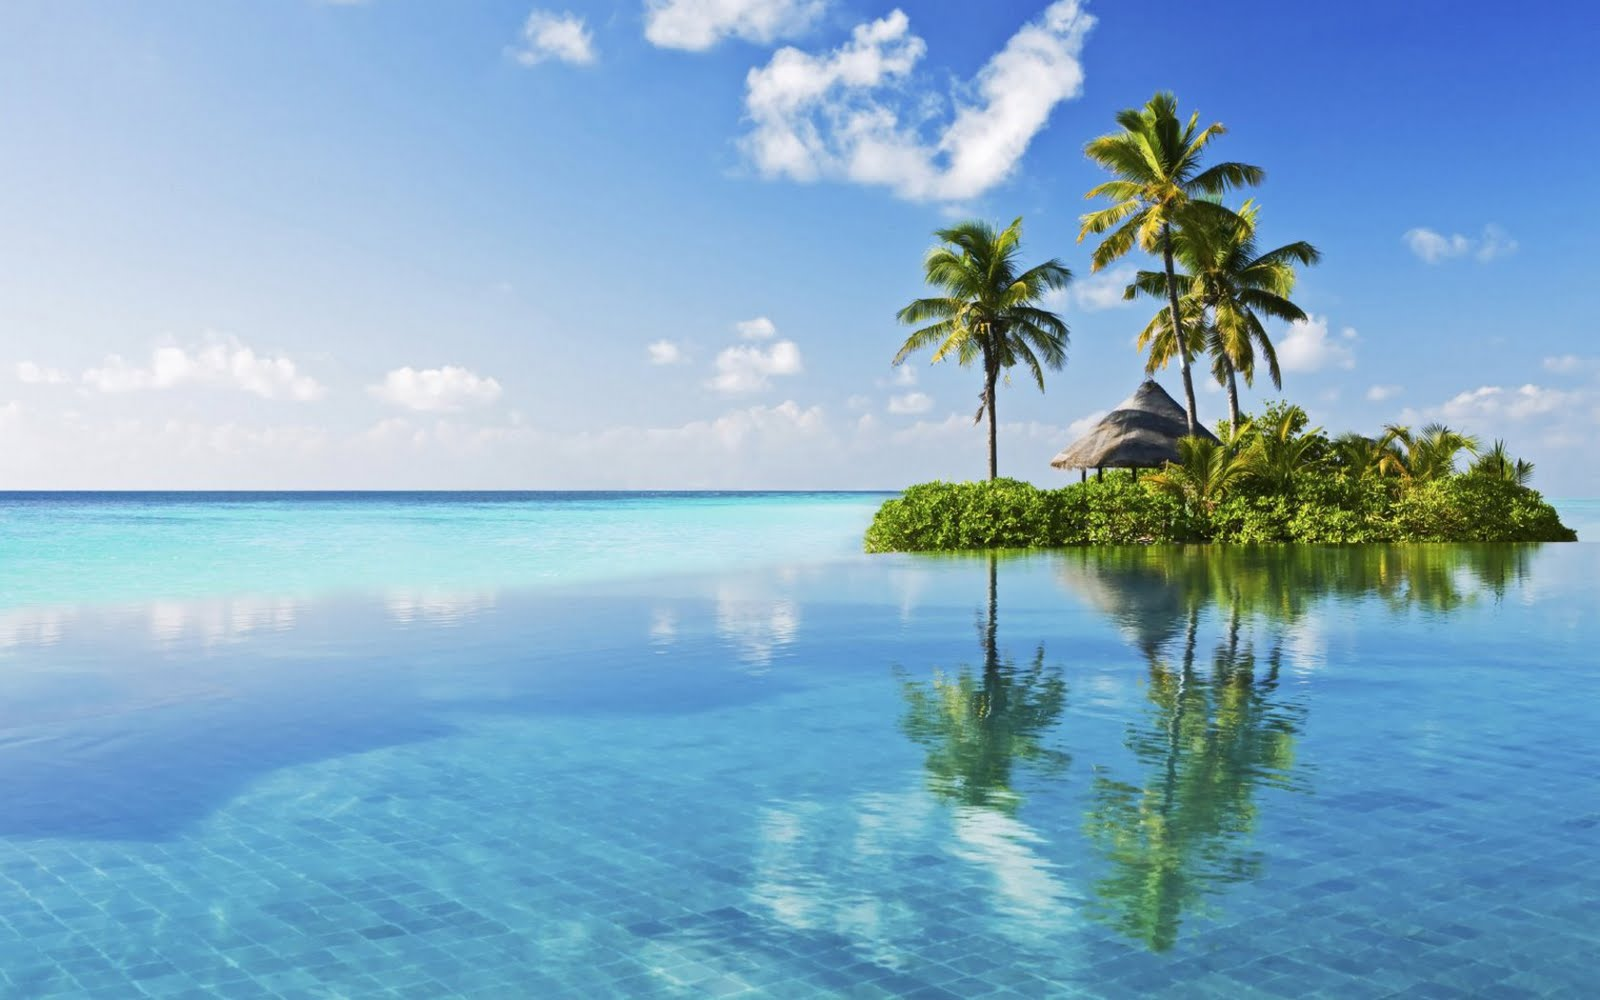 Palm Tree Beach Wallpaper image gallery 1600x1000